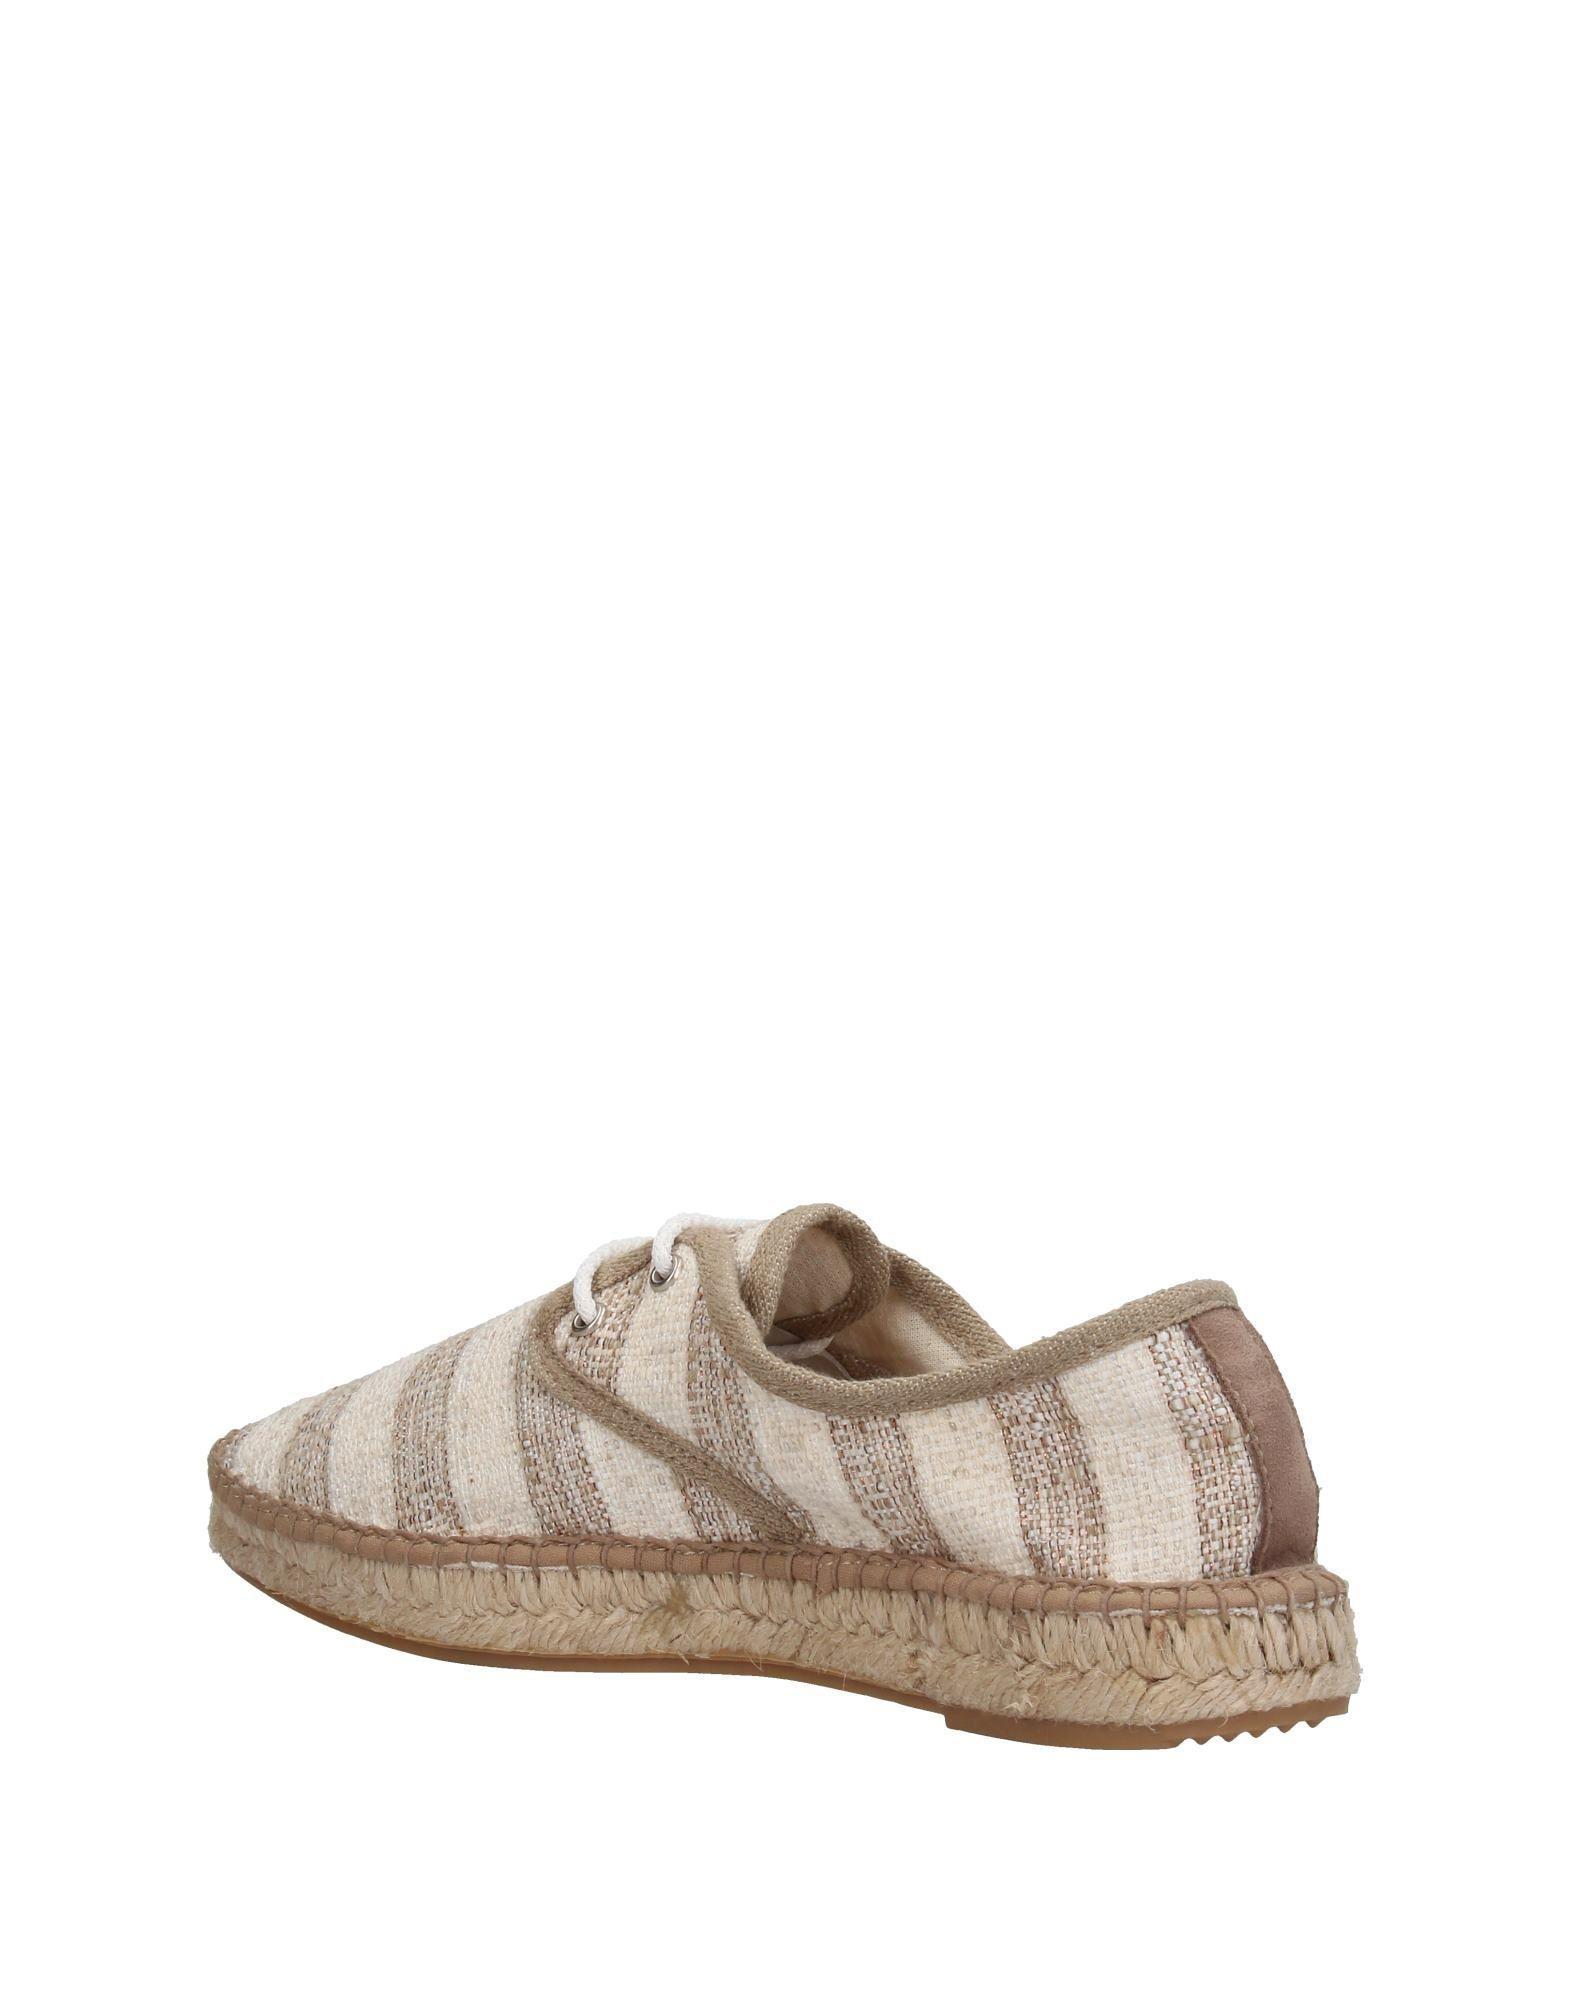 48da10b869ba Toni Pons Lace-up Shoe in Natural - Lyst